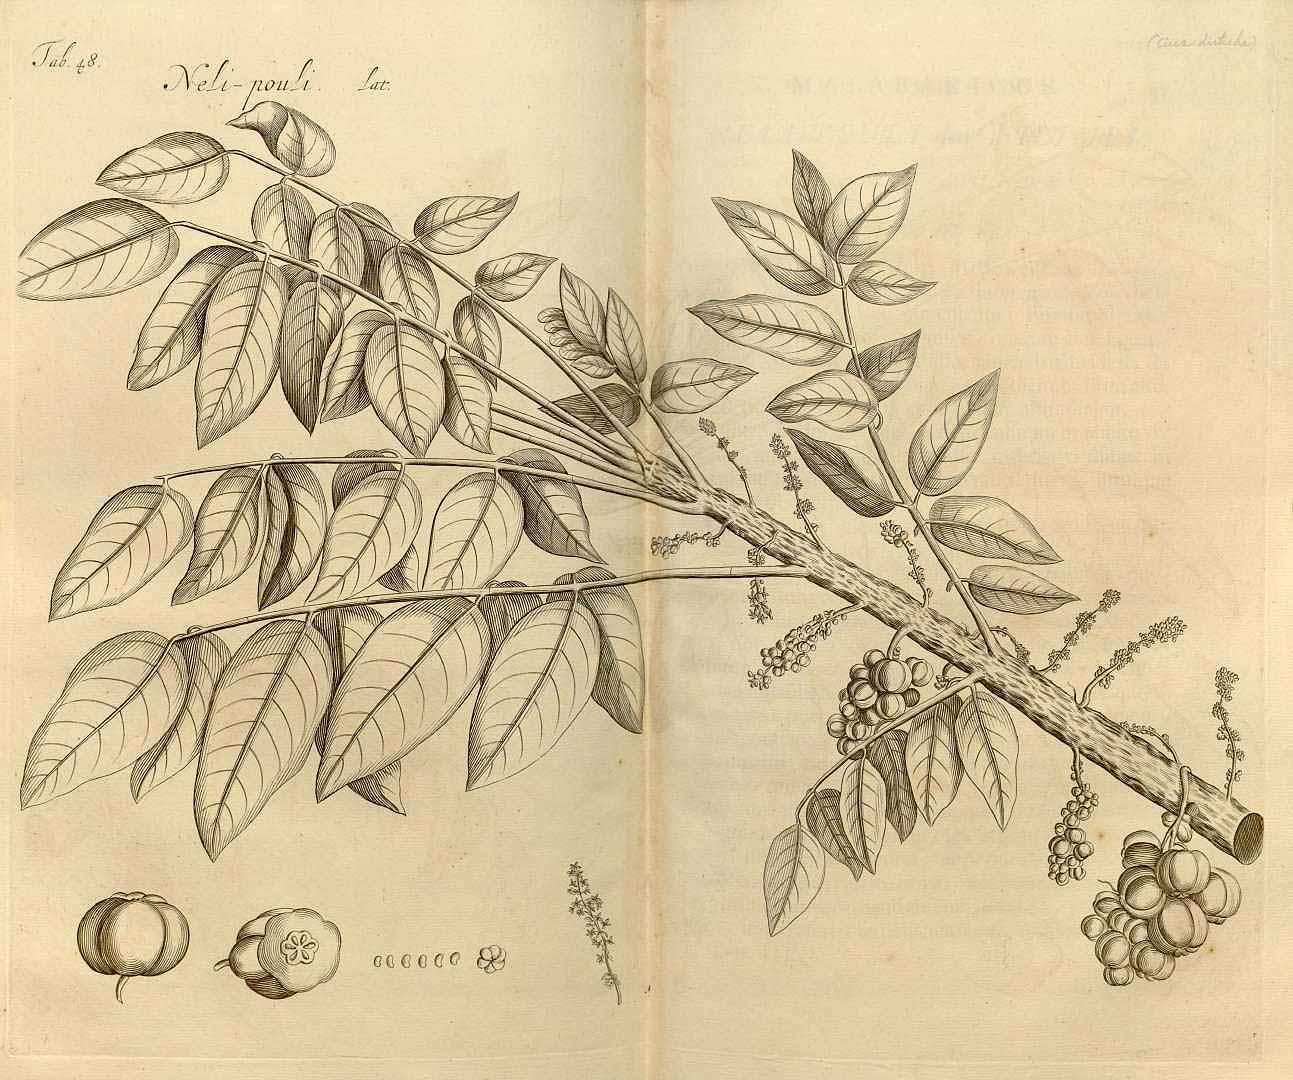 Phyllanthus acidus (มะยม ; ma yohm)